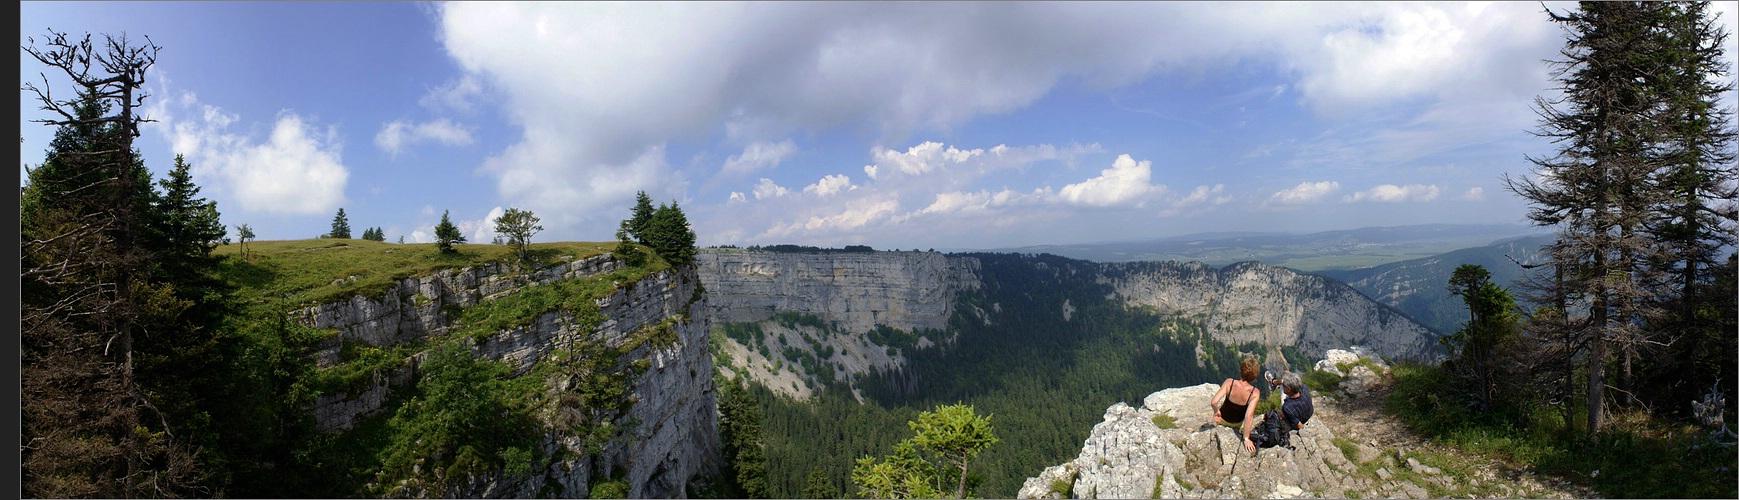 Creux du Van - Panorama II